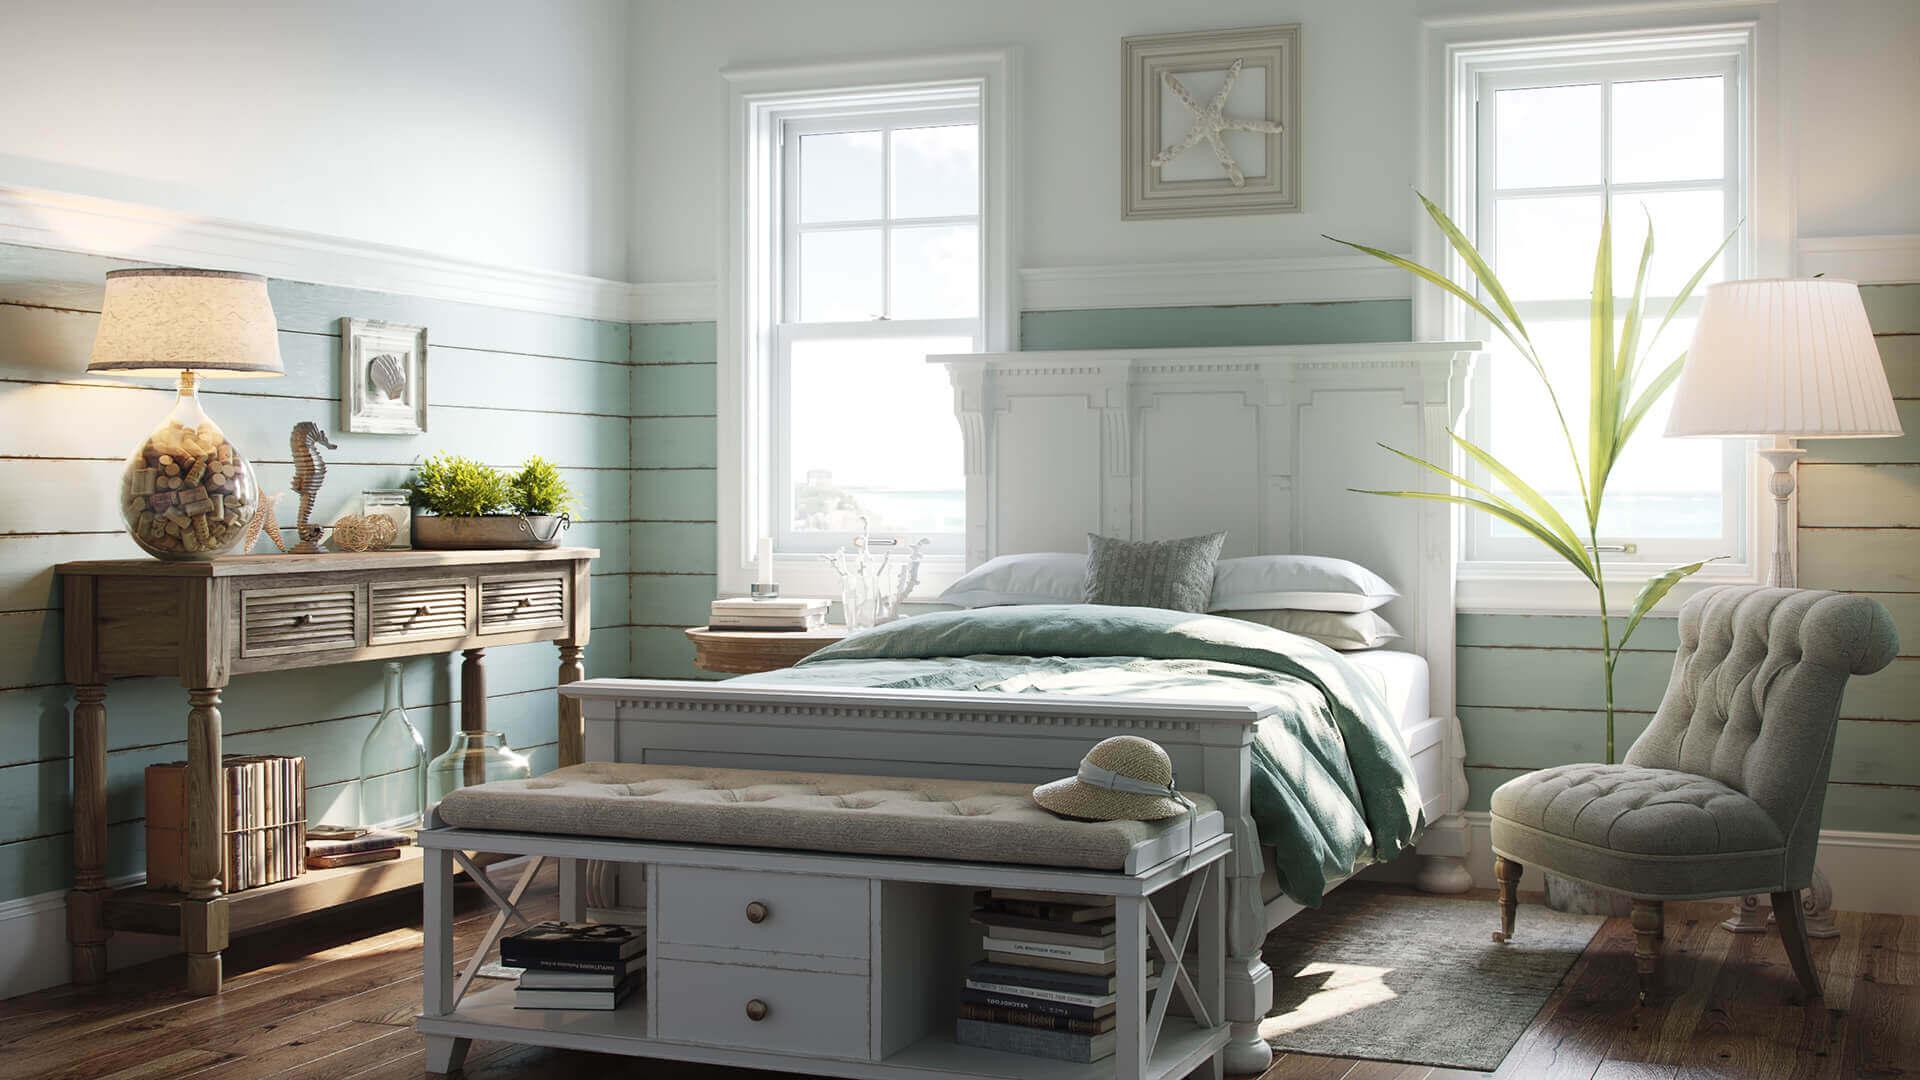 3D Visualization for a Pretty Coastal Bedroom Design